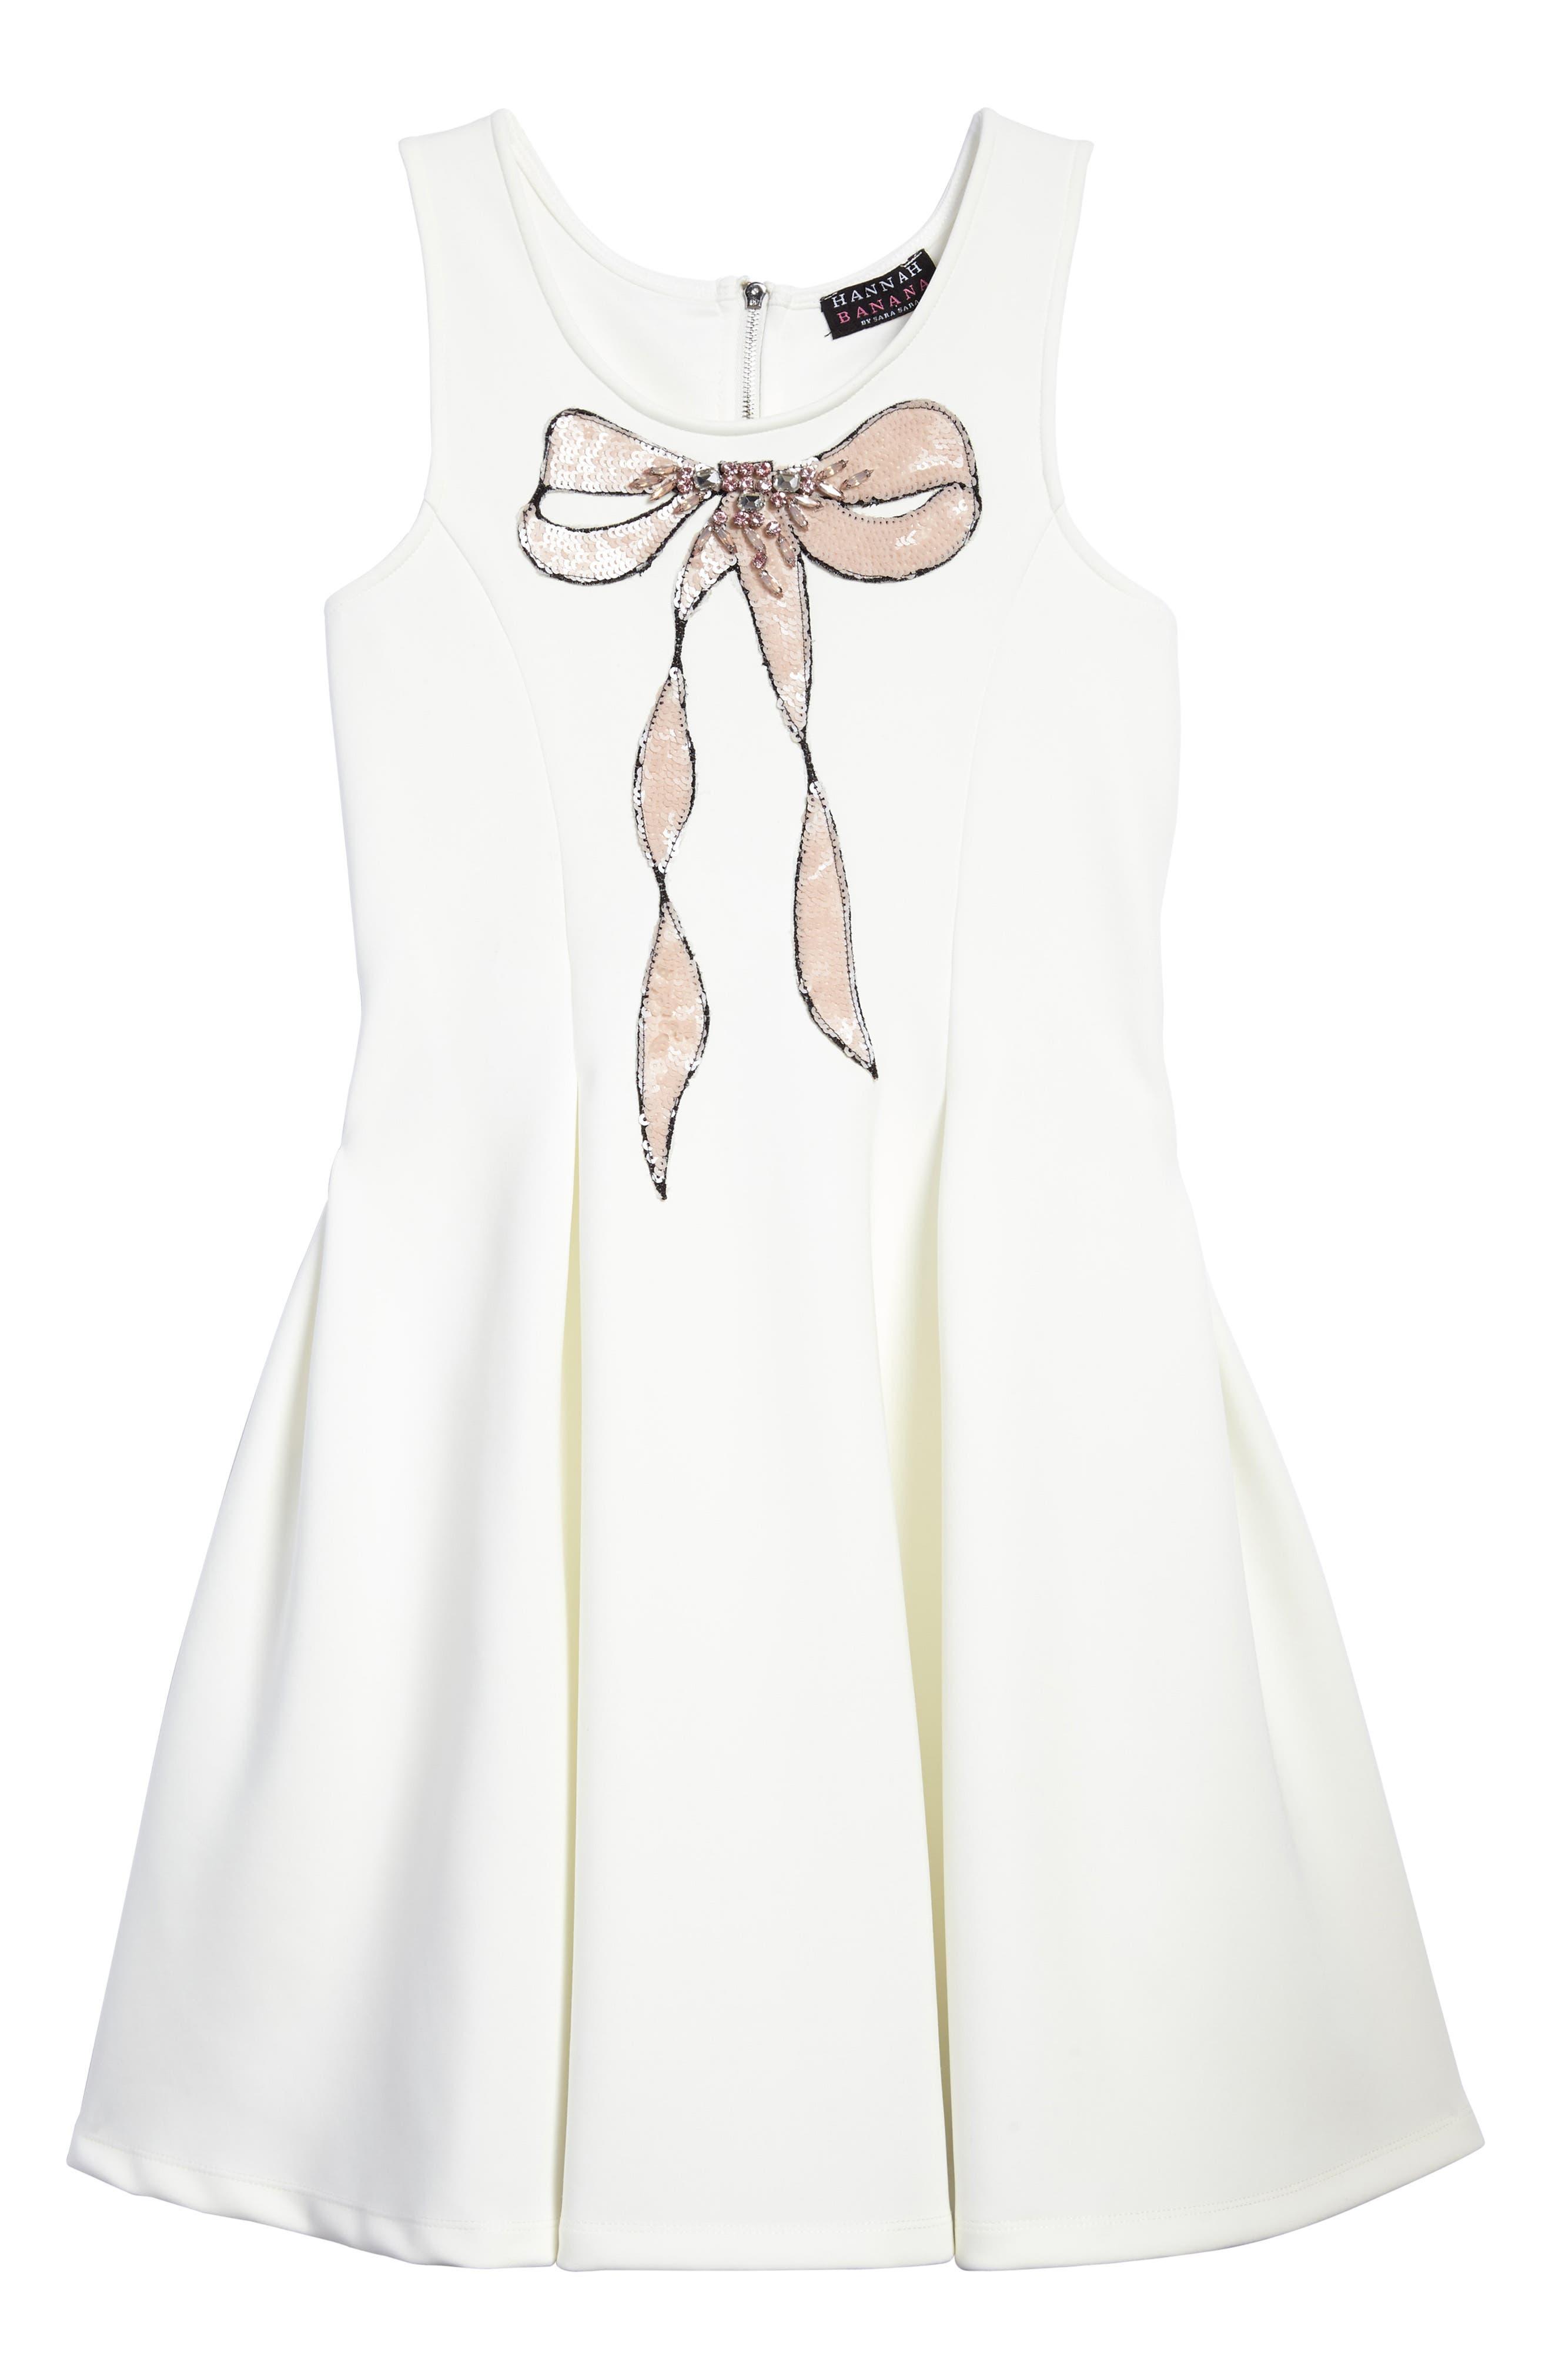 Sequin Embellished Bow A-Line Dress,                         Main,                         color, 250